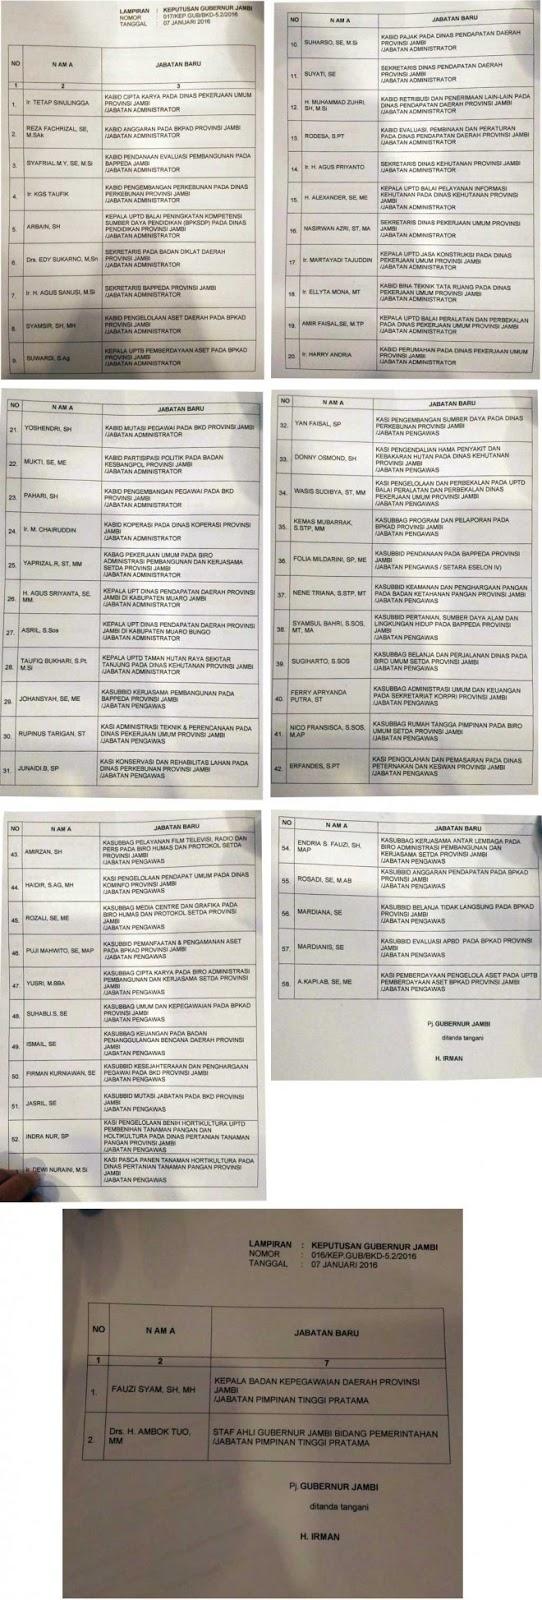 Pj Gubernur Lantik 60 Pejabat, Ini nama-nama yang dilantik